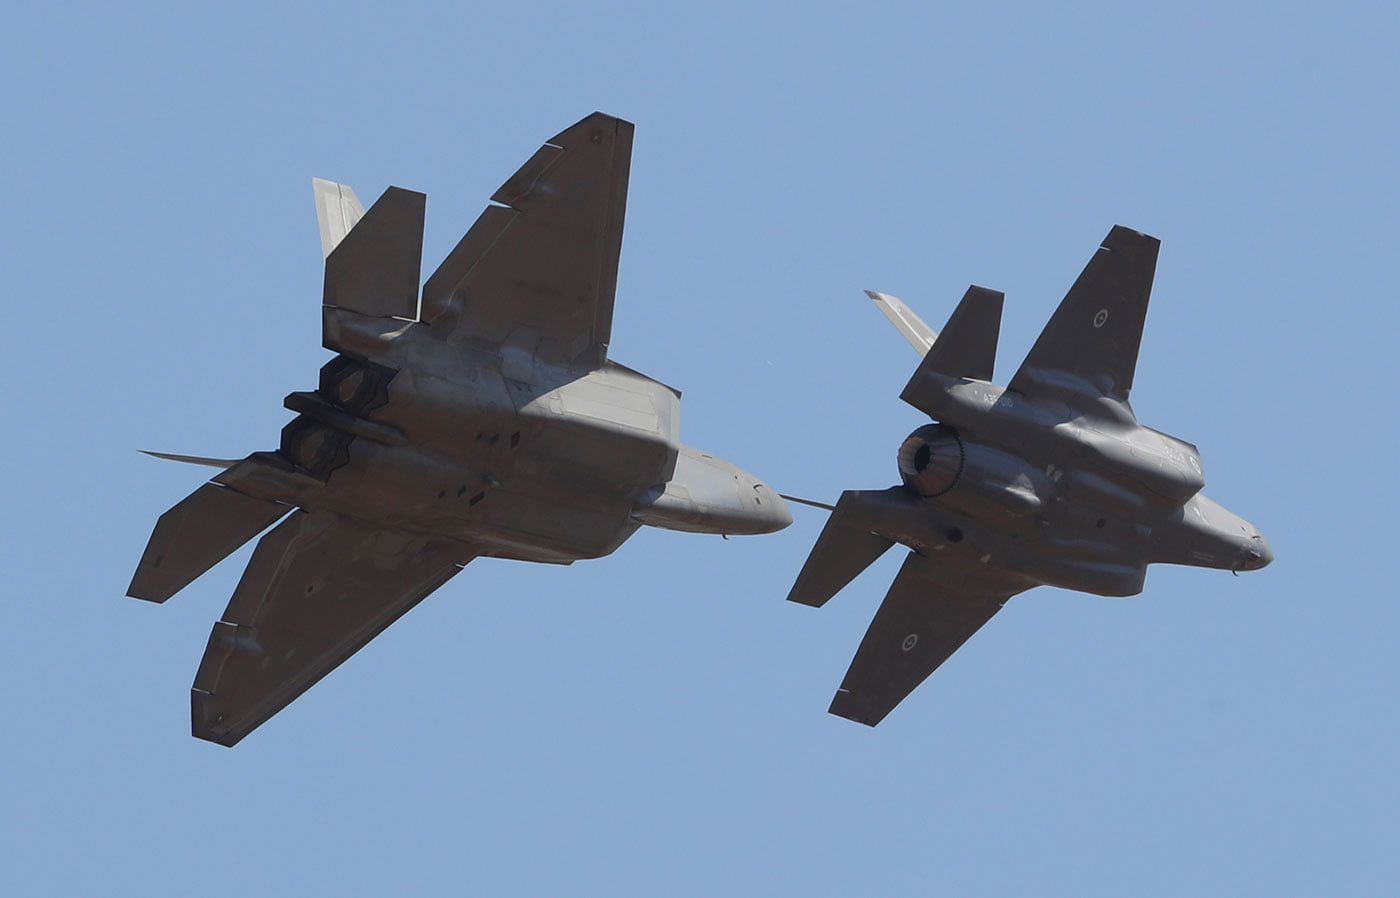 F-35: Η Ελλάδα μπαίνει στο «κόλπο» – Ήδη η Αθήνα έχει ζητήσει εγγράφως ενημέρωση από τους Αμερικανούς – Τι είπε ο πρωθυπουργός